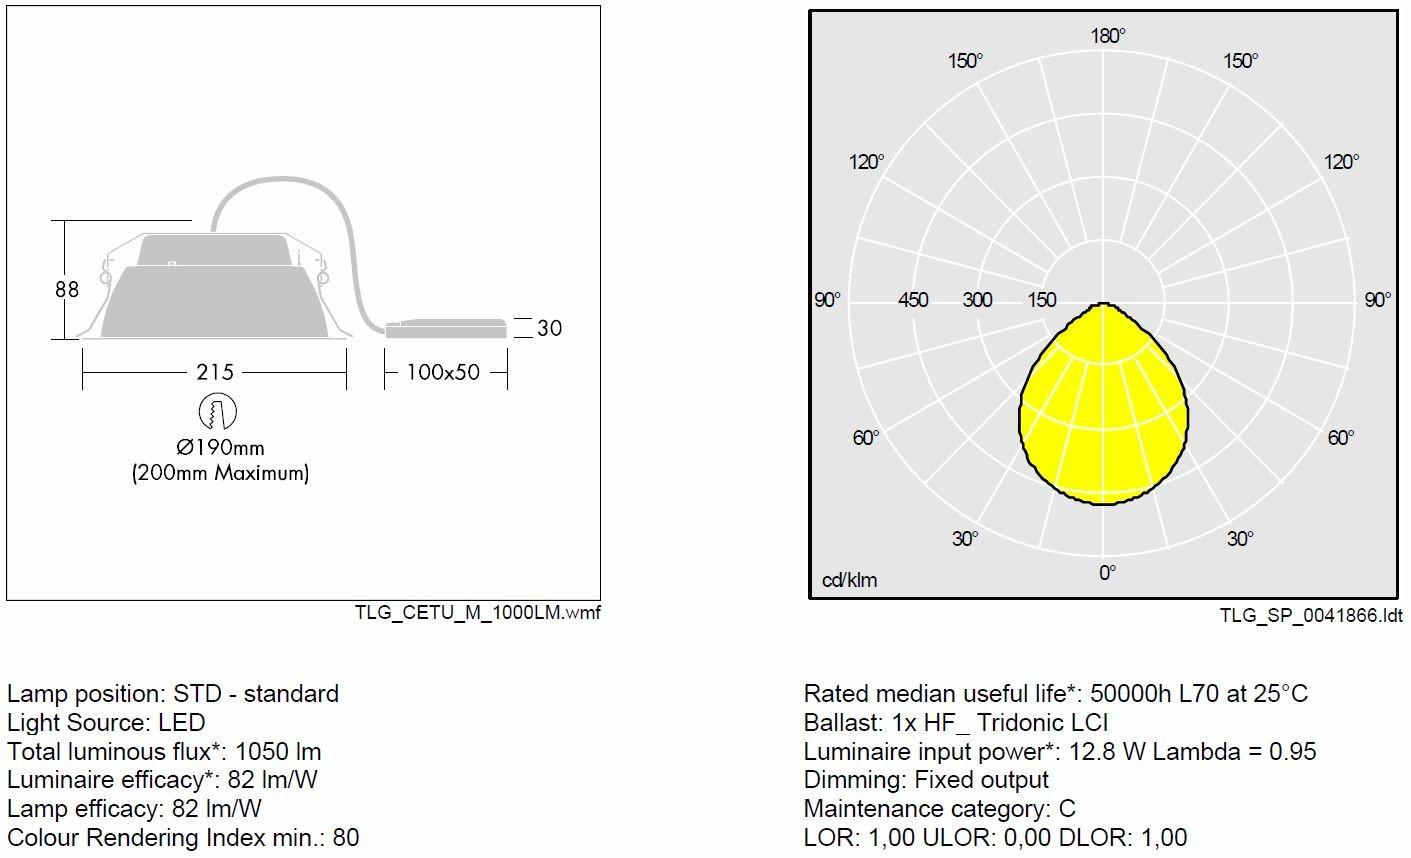 Thorn Emergency Lighting Wiring Diagram Circuit Downlights Cetus Led Downlight 1050lm 840 13w 96242099 Emergencyrh